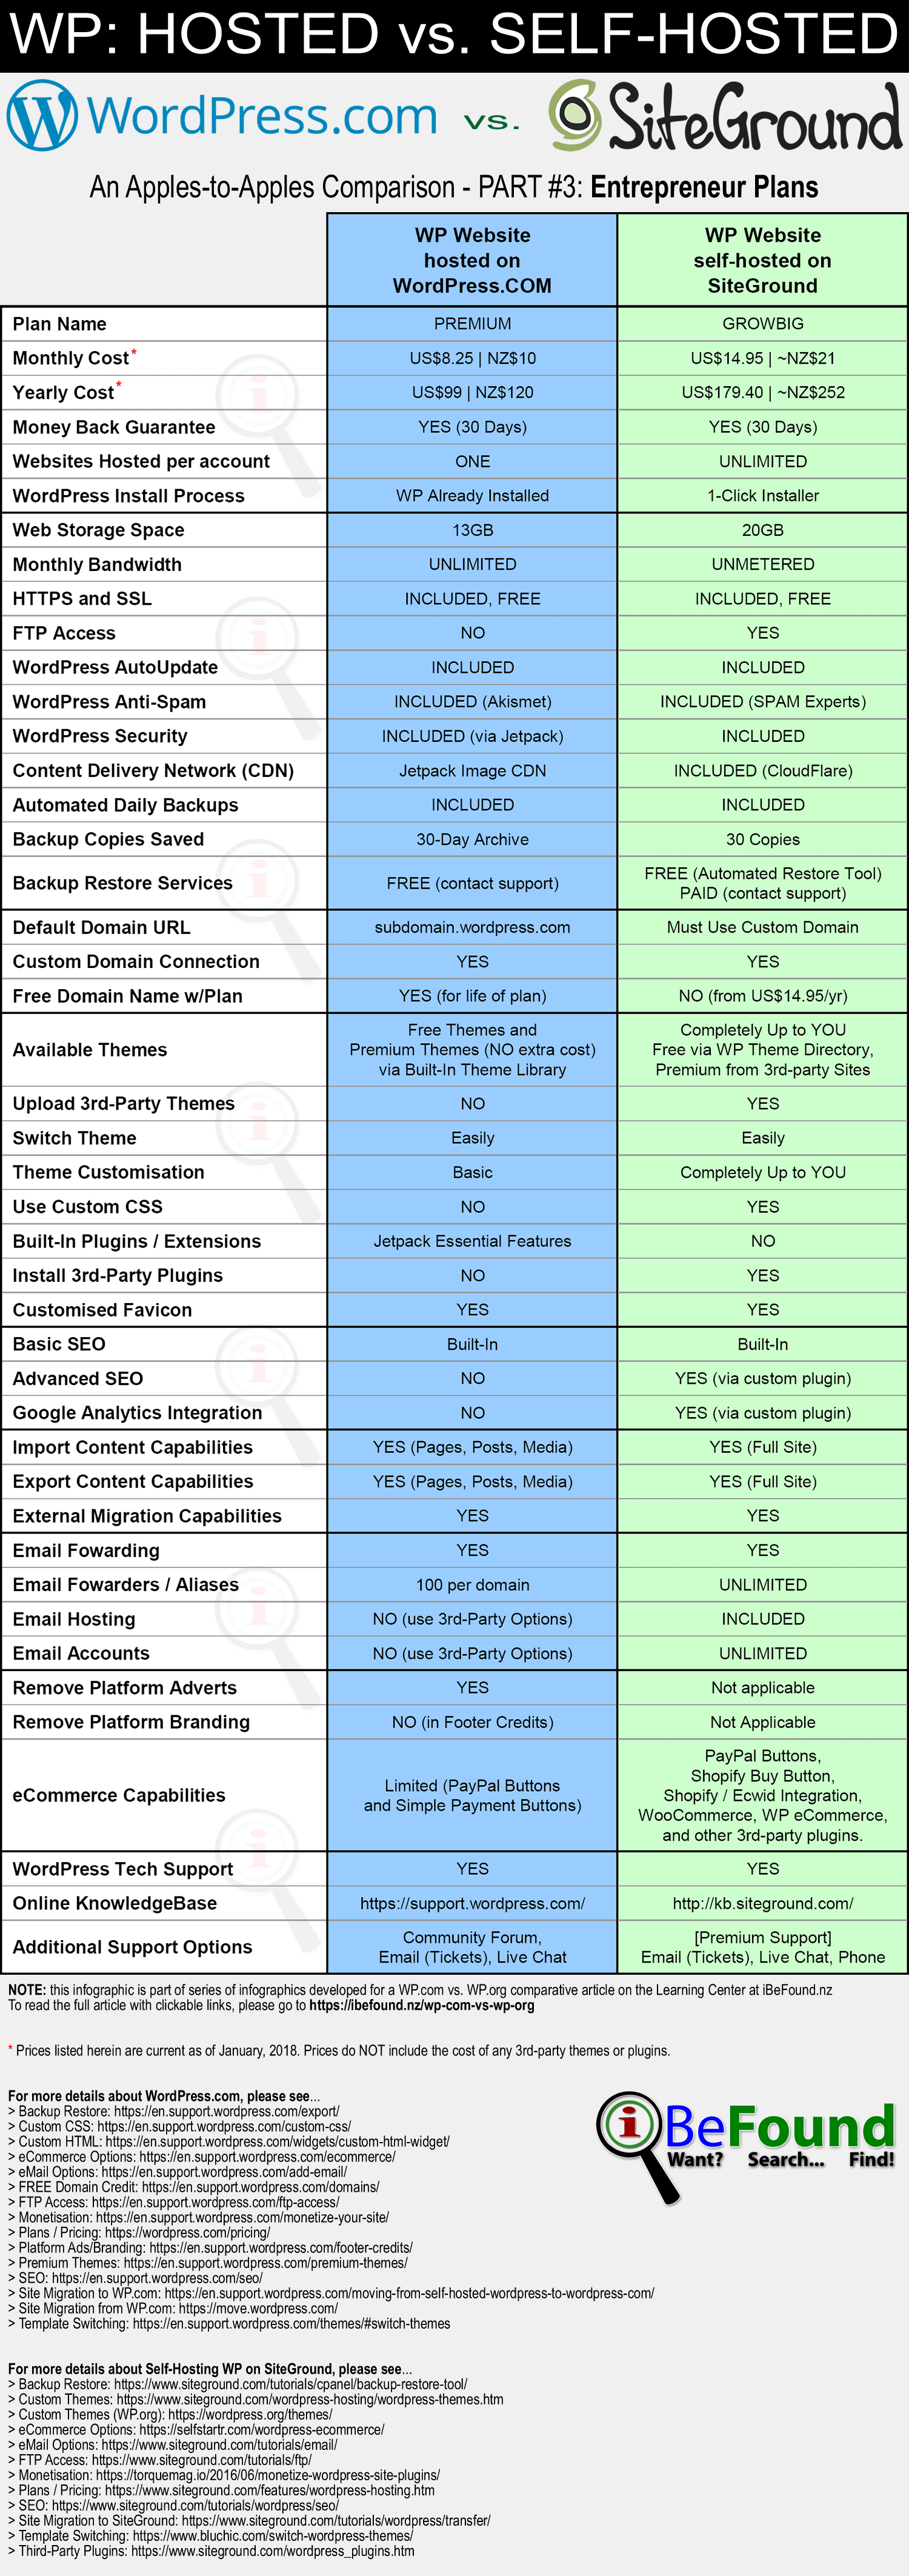 Hosted WordPress Versus Self Hosted WP On SiteGround 2018 Comparison Infographic Pt3 Freelancer Plans